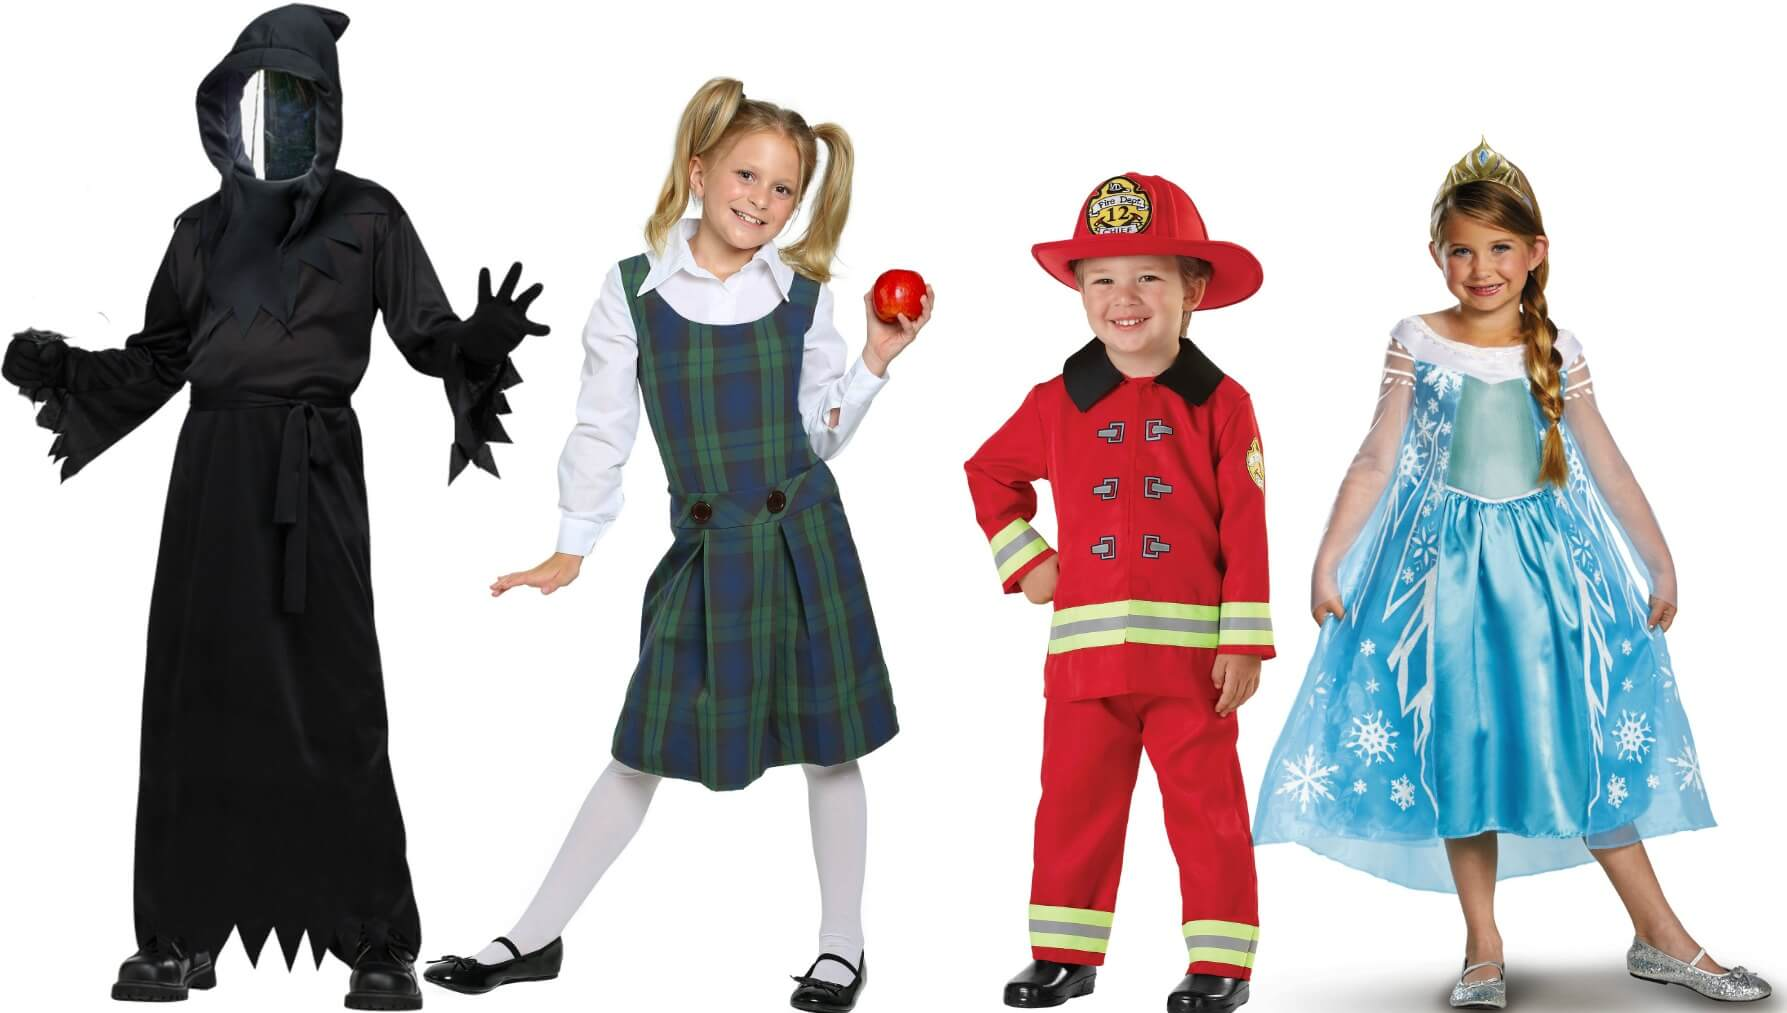 Cheap Halloween Costume Ideas - Halloween Costumes Blog